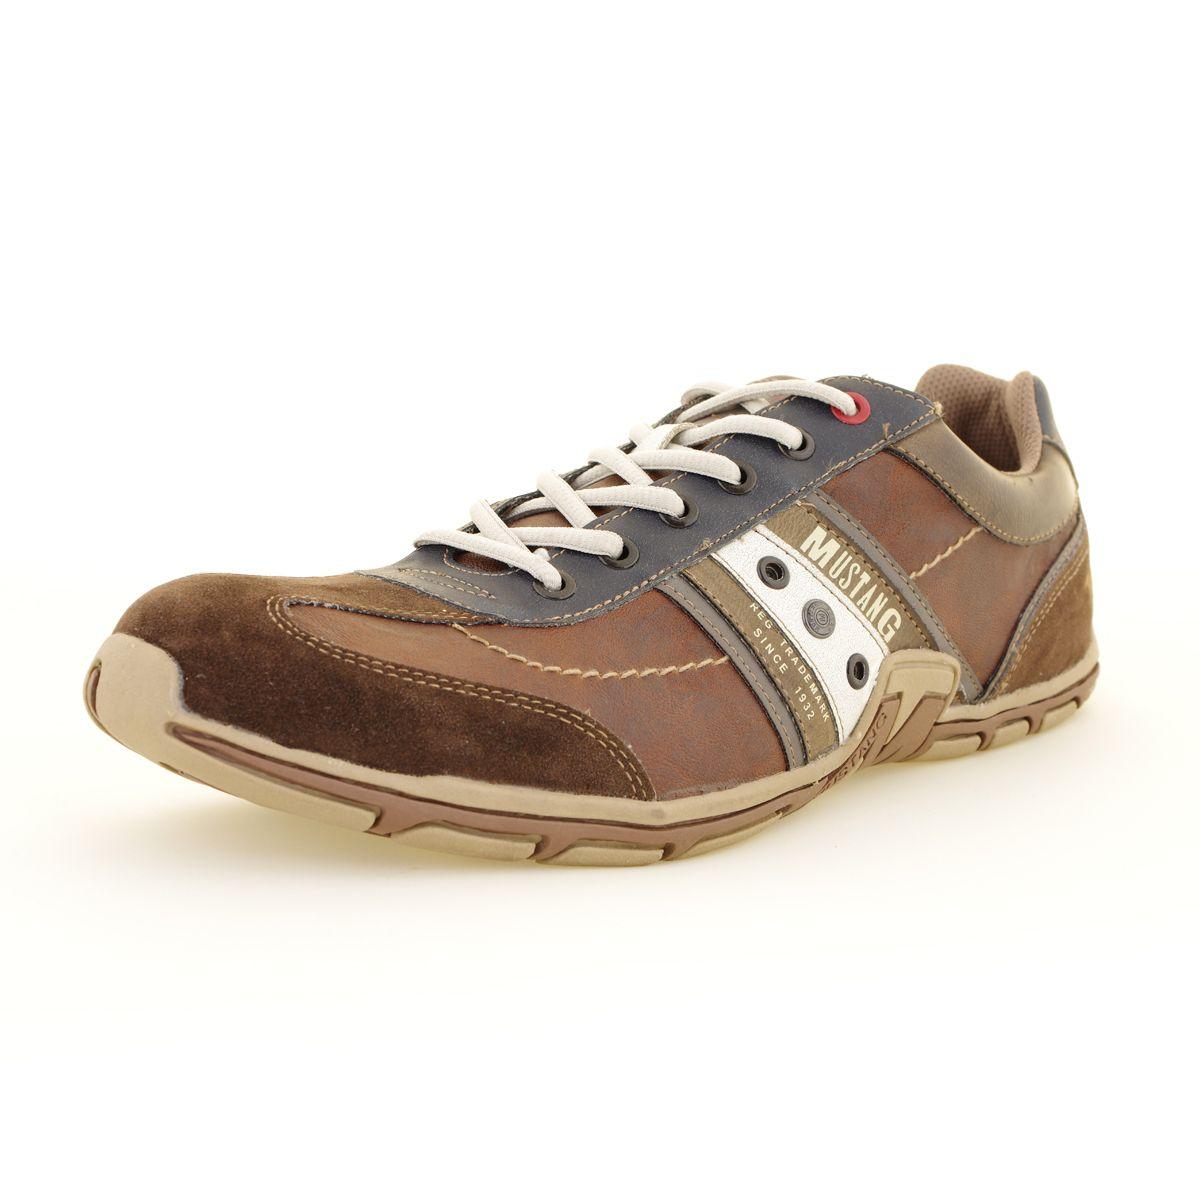 chaussures marron grande taille jusqu 39 au 50 size. Black Bedroom Furniture Sets. Home Design Ideas